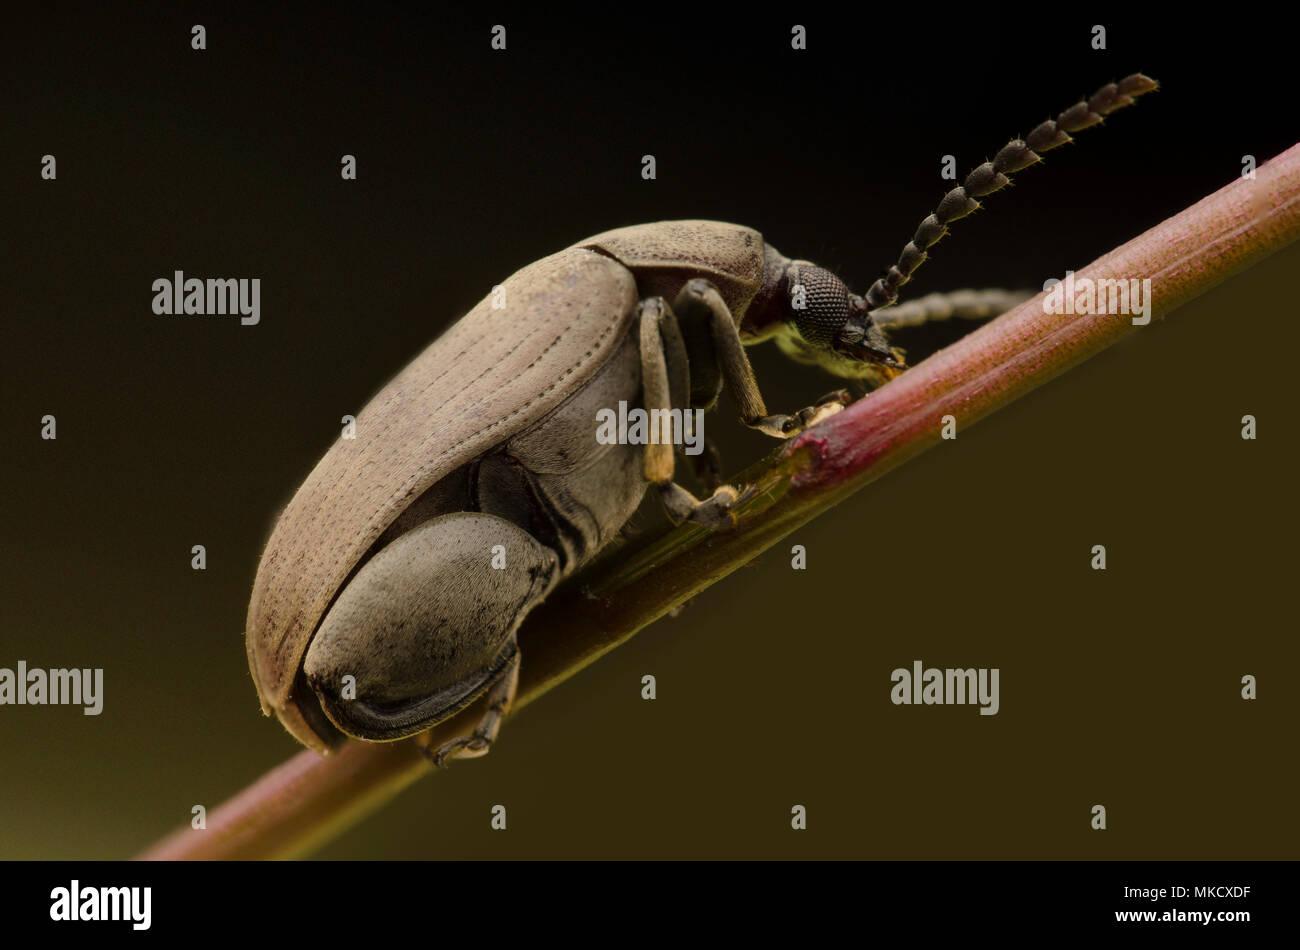 Chrysomelidae Photo Stock